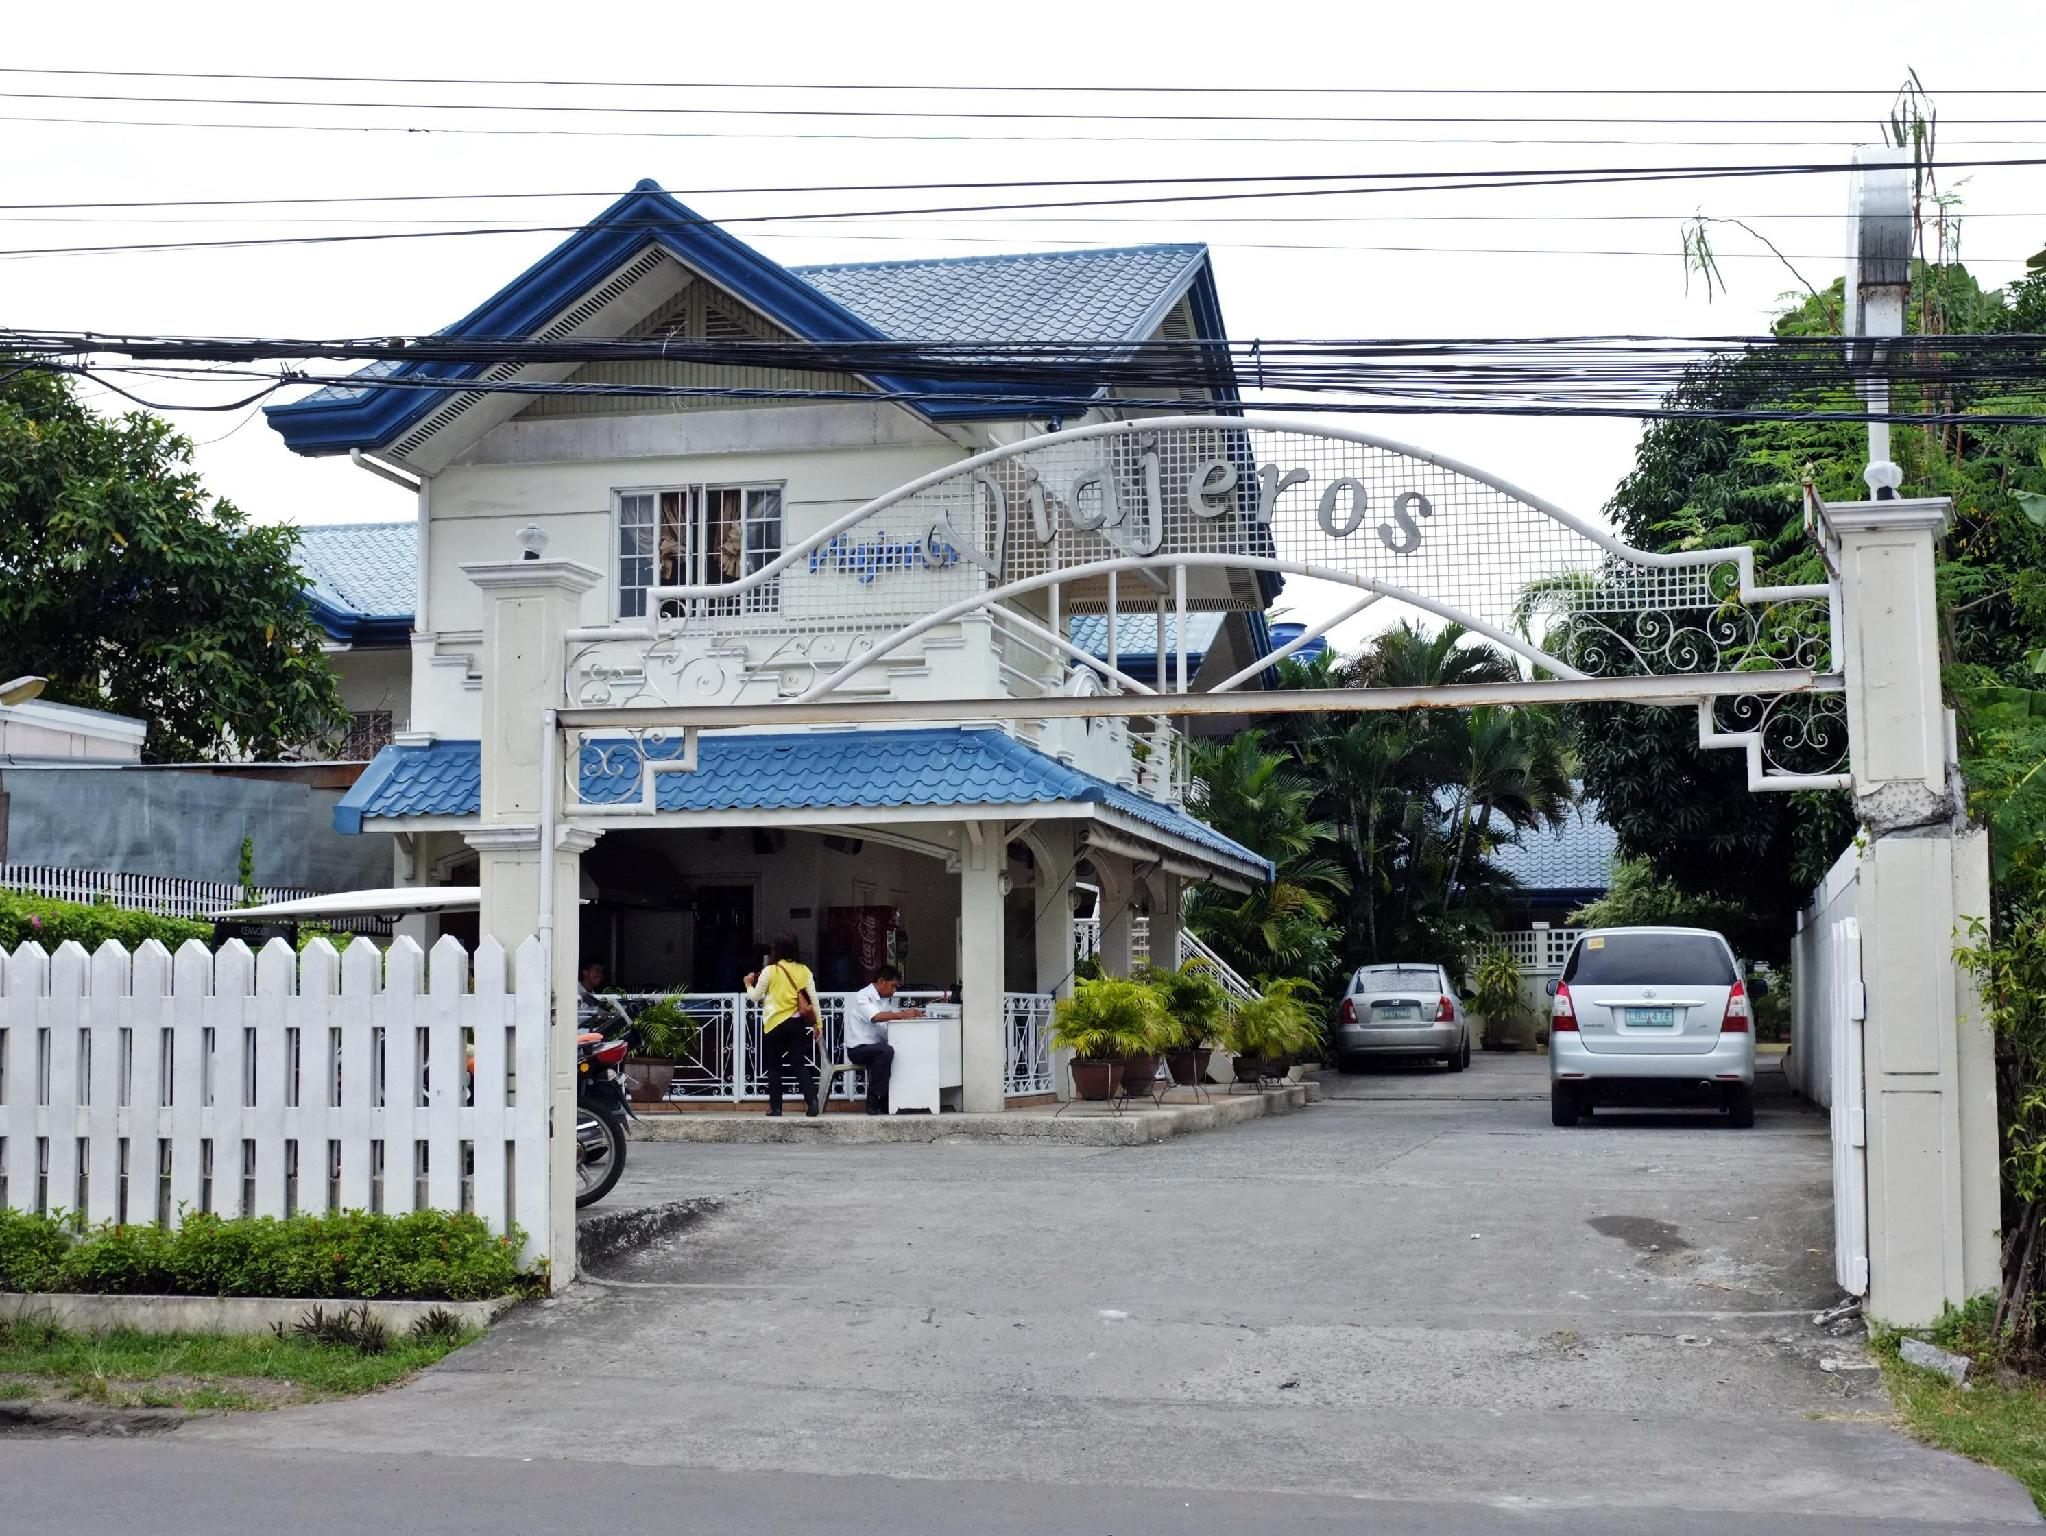 Viajeros Economy Inn דבאו - בית המלון מבחוץ